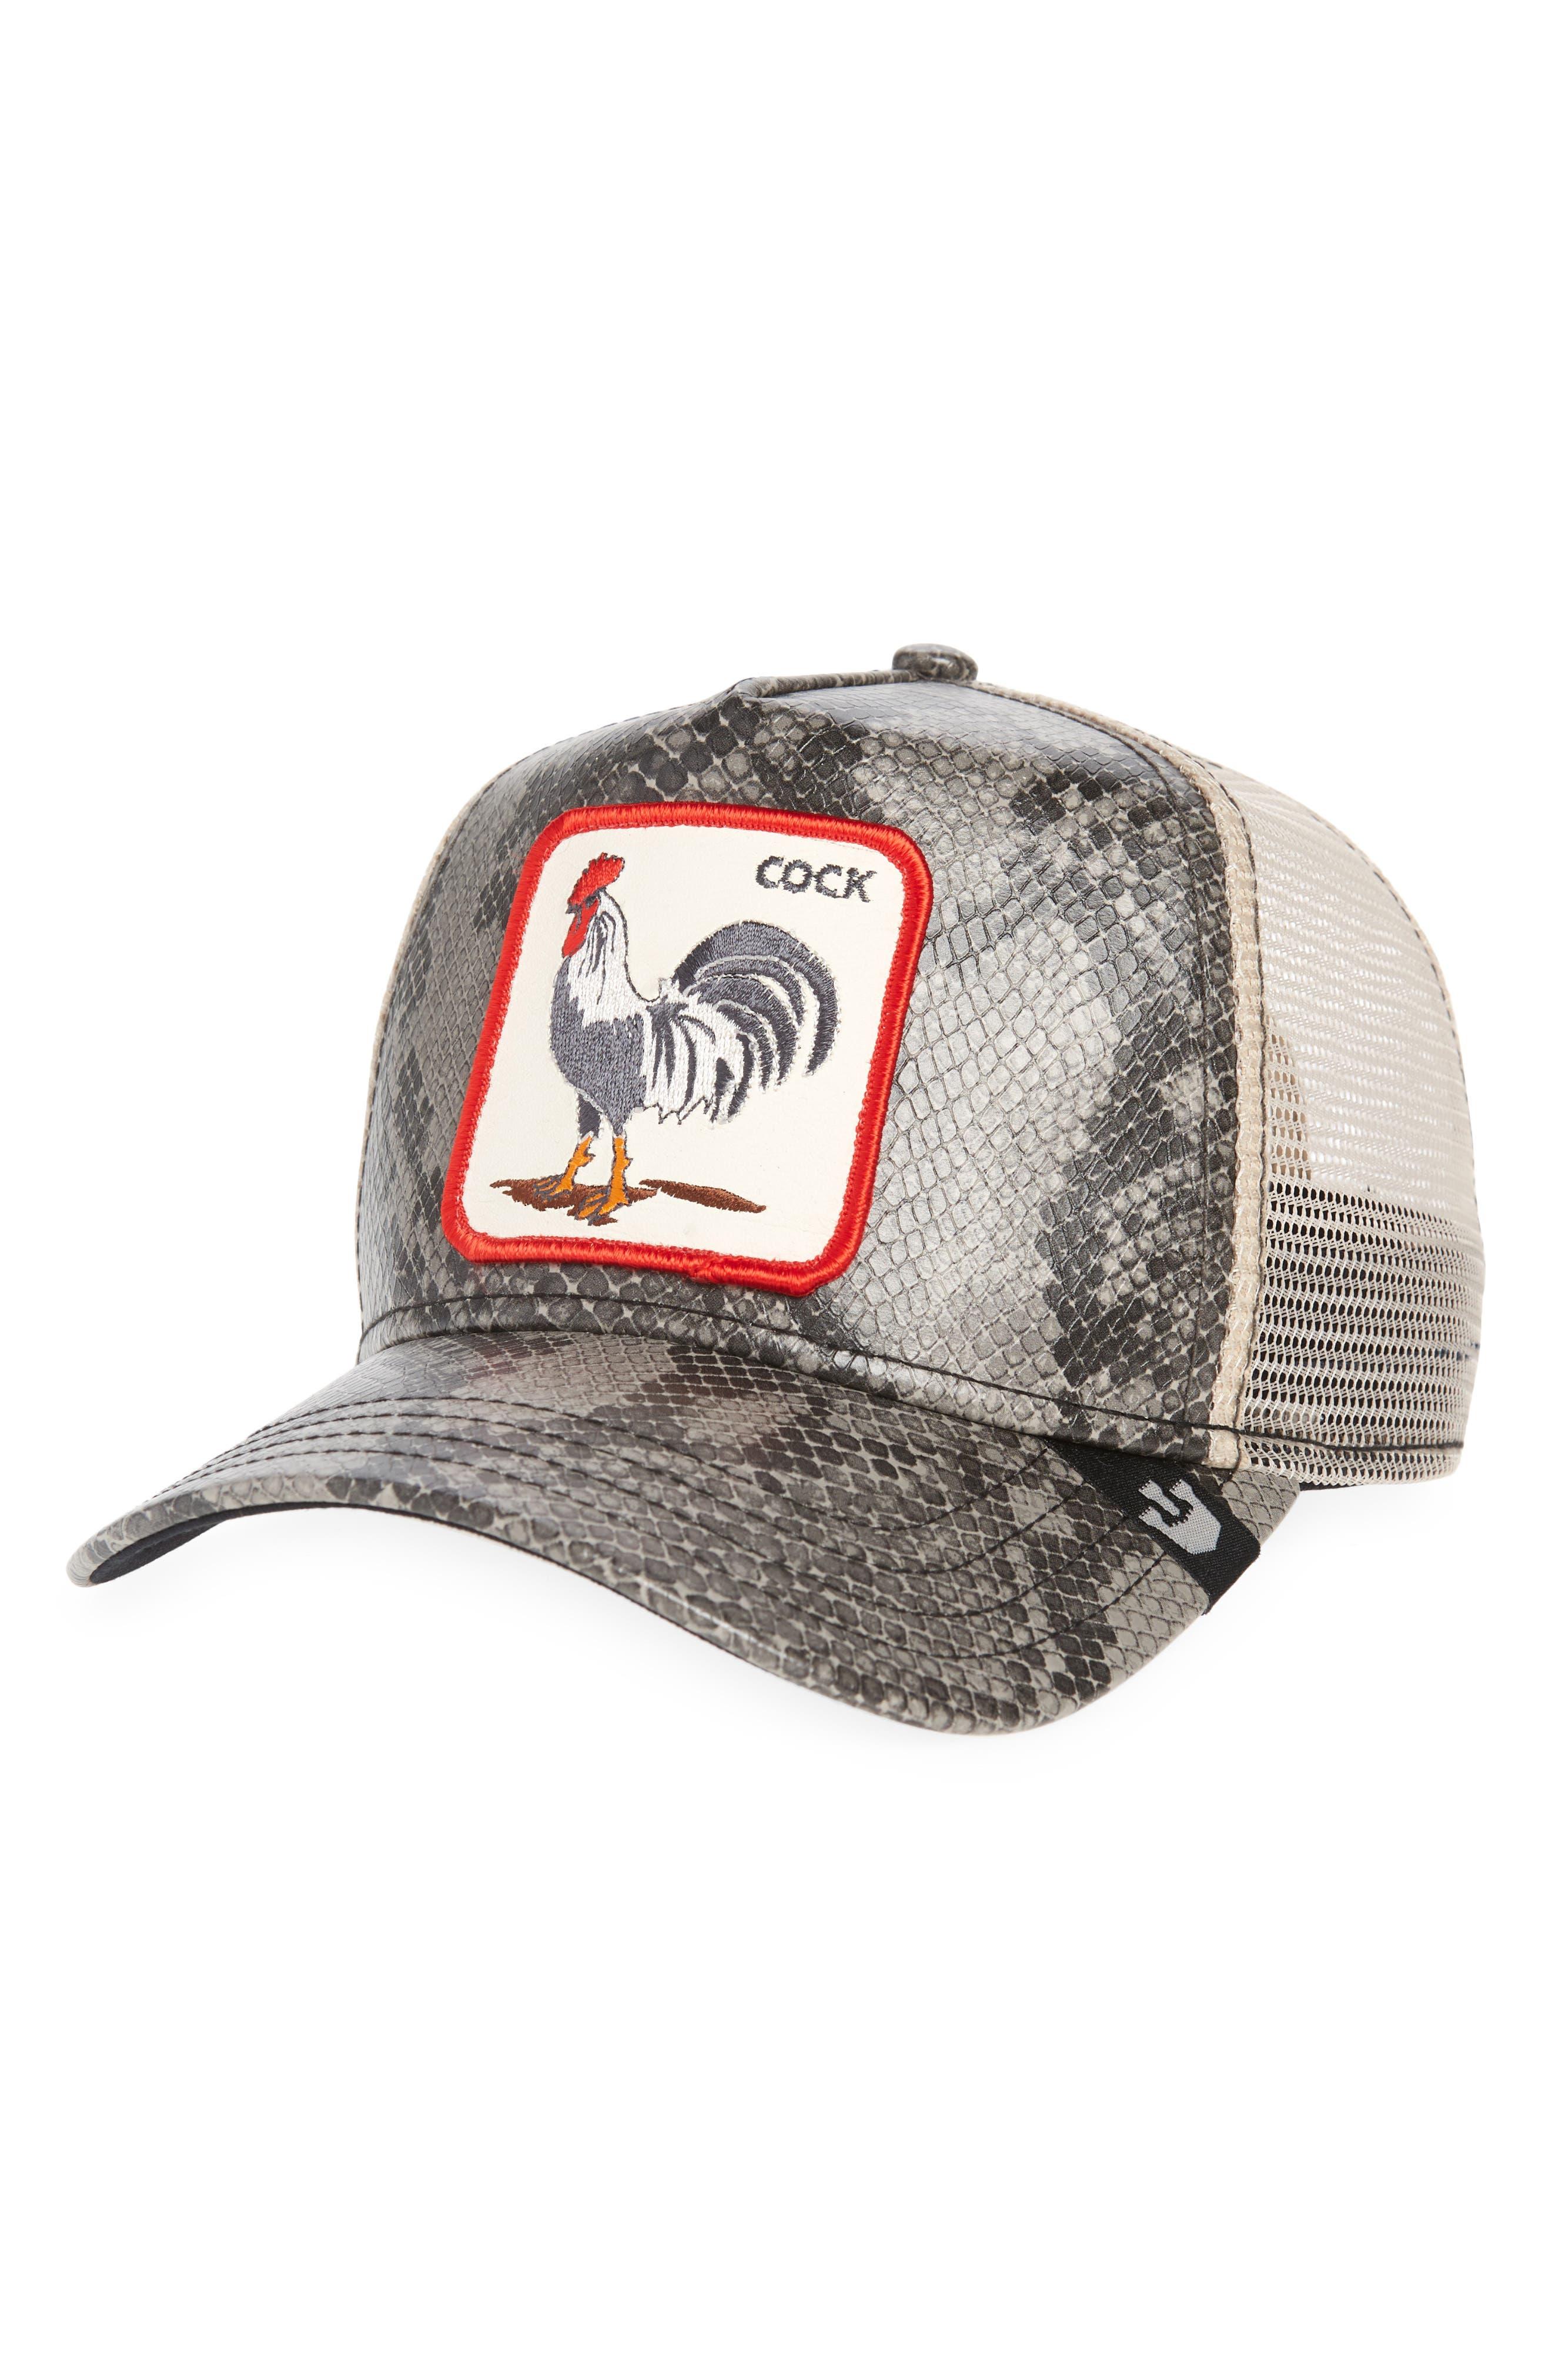 . Rooster Rattler Trucker Hat